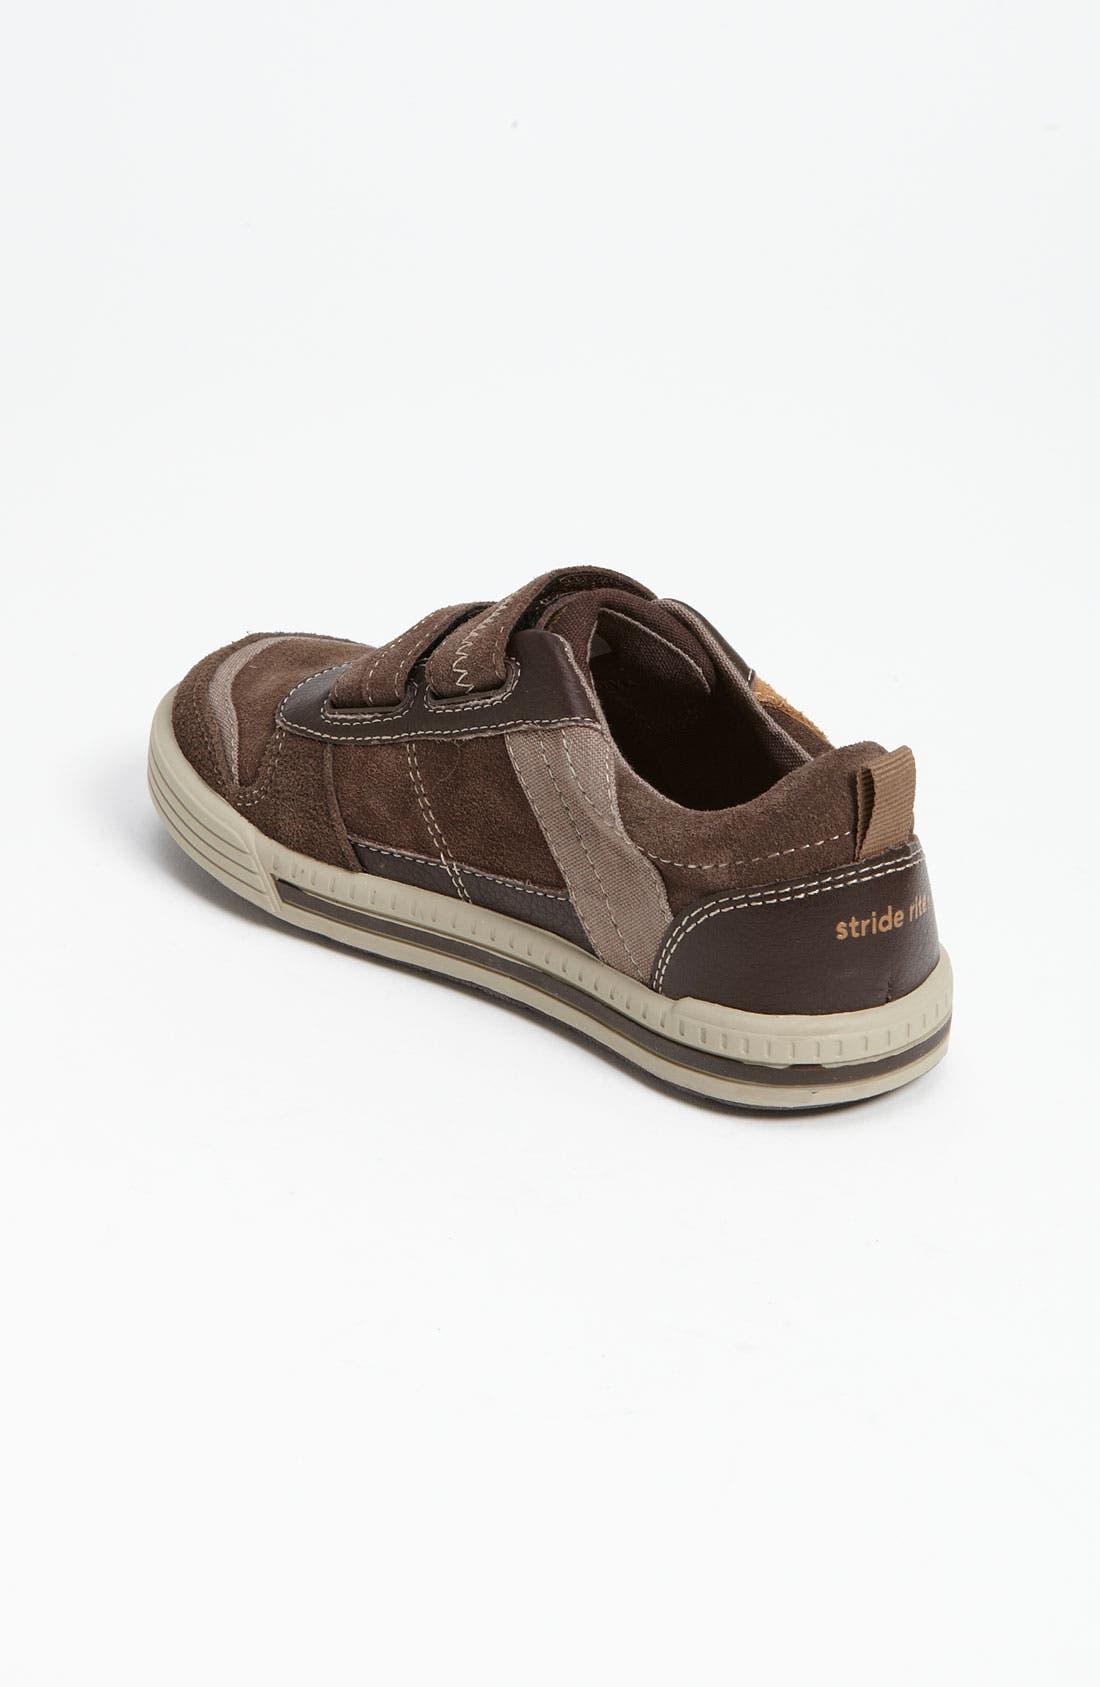 Alternate Image 2  - Stride Rite 'Tex' Sneaker (Toddler)